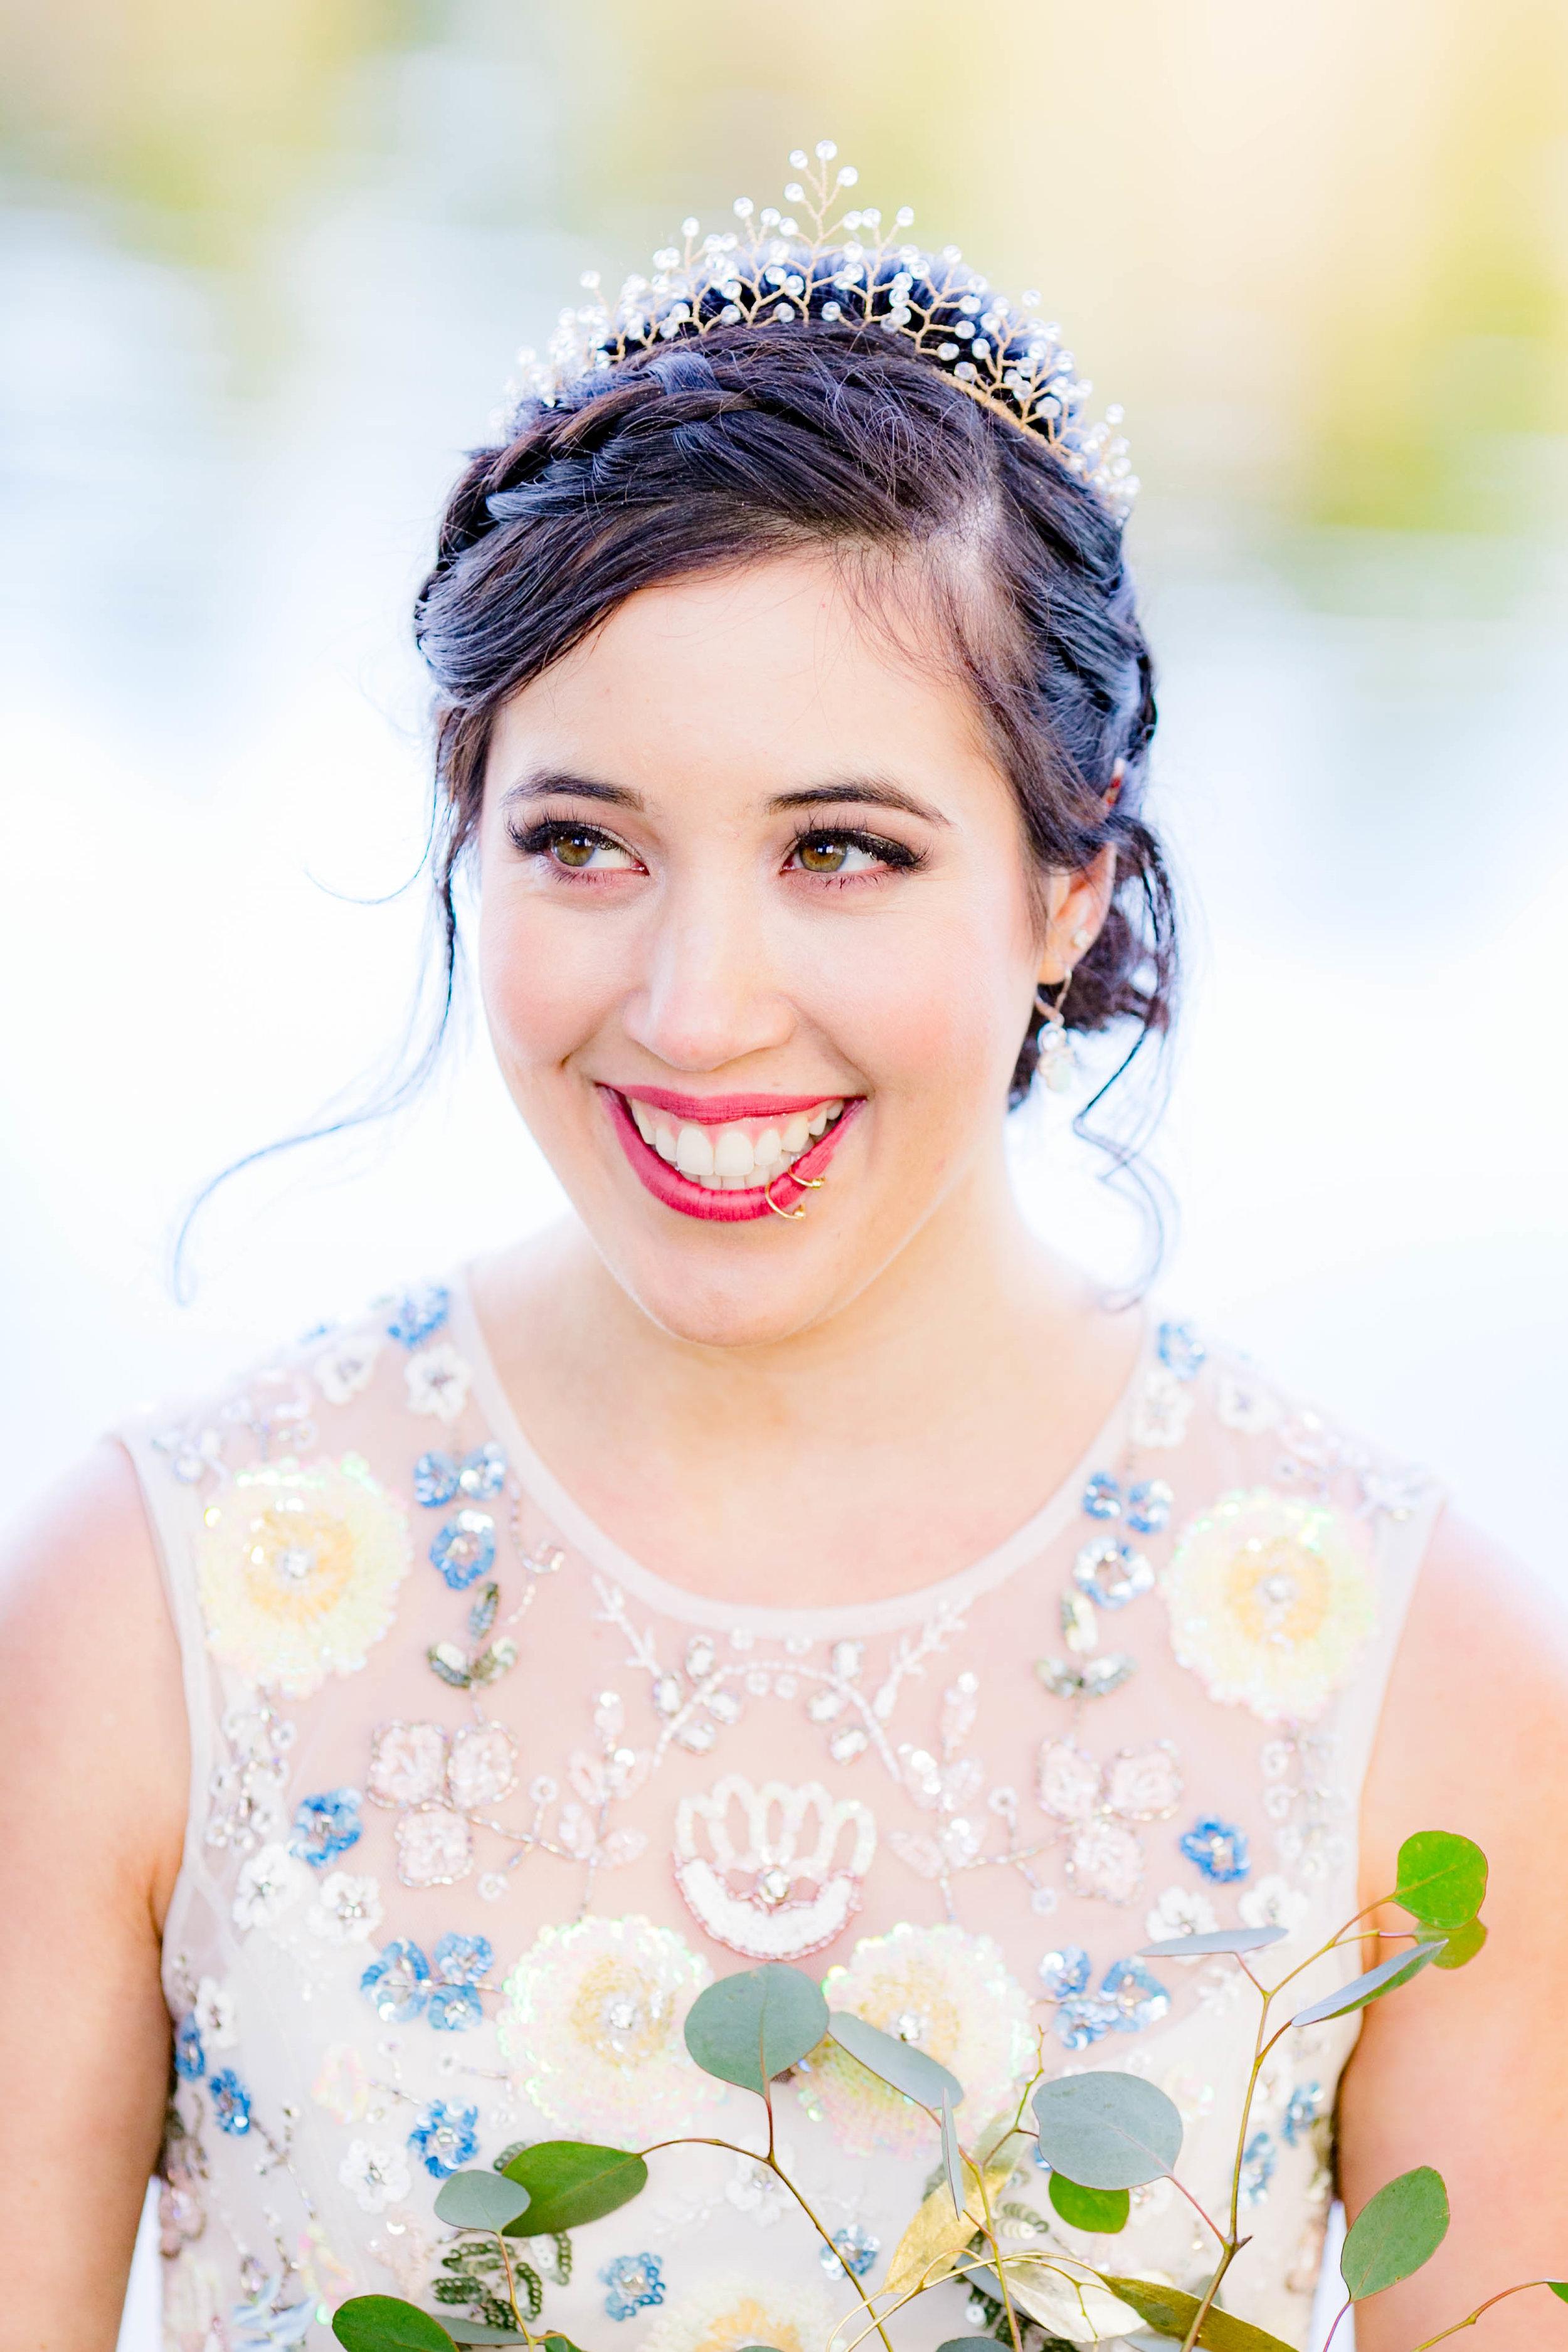 Bridal portrait, joyful bride